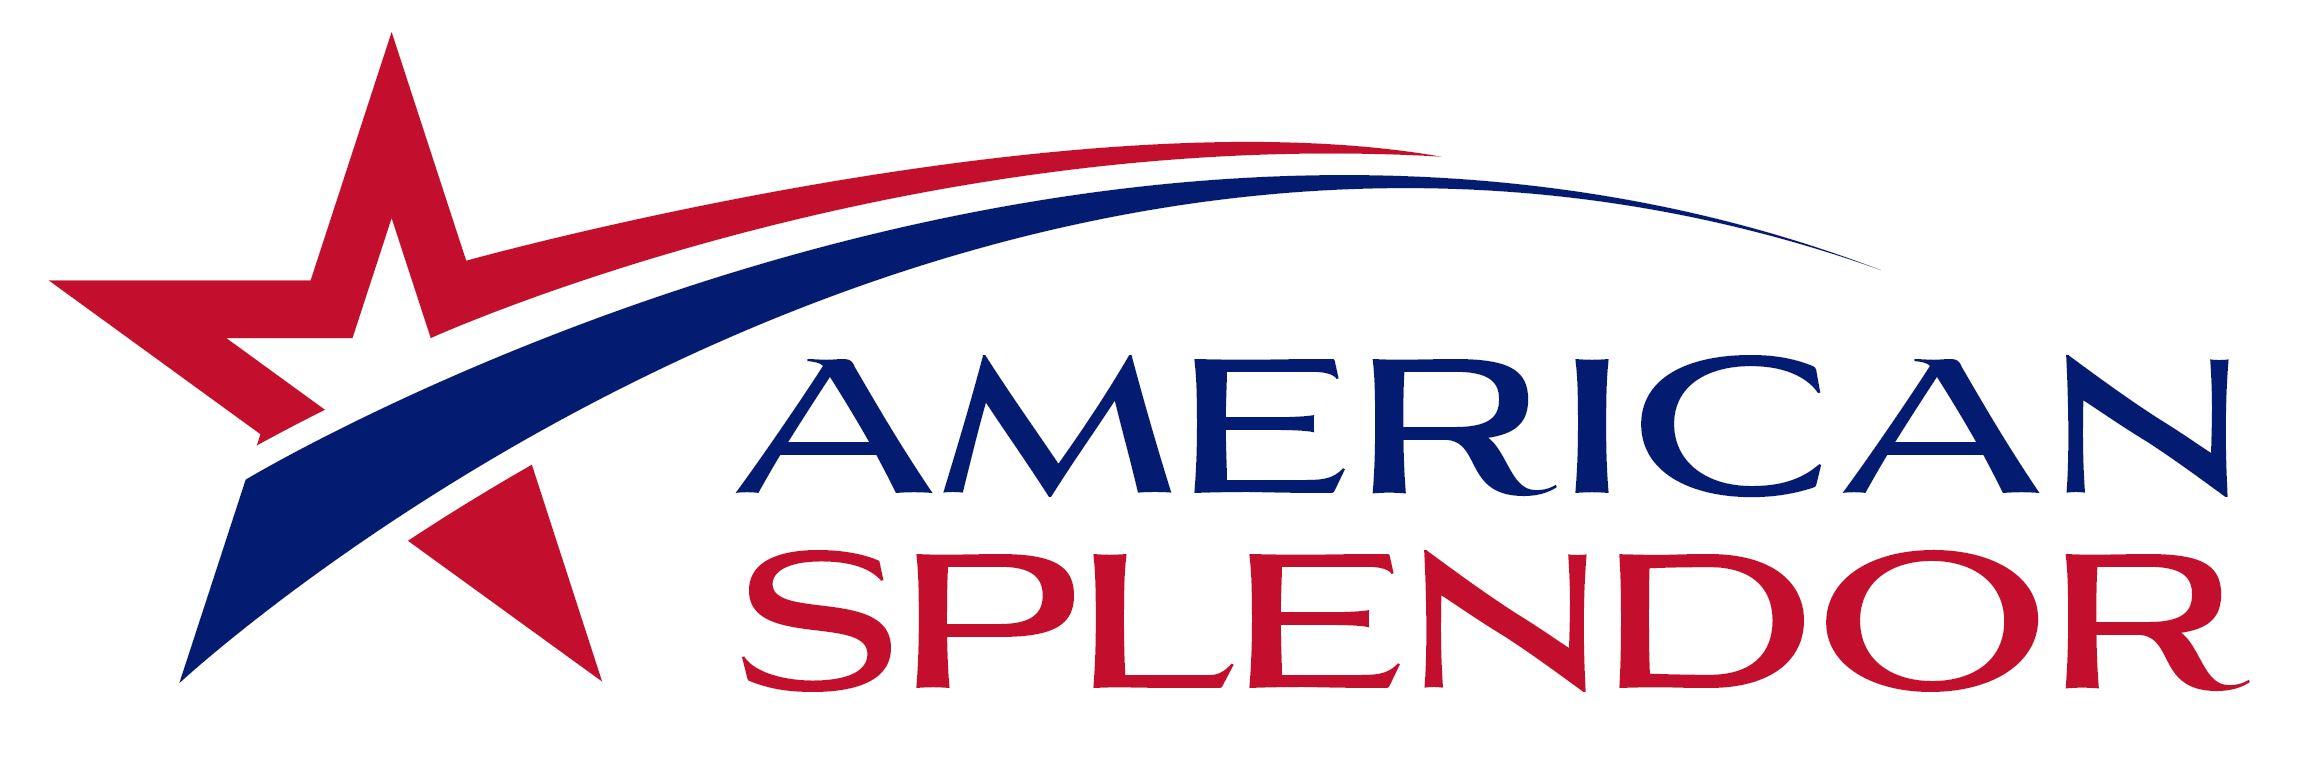 American Splendor logo